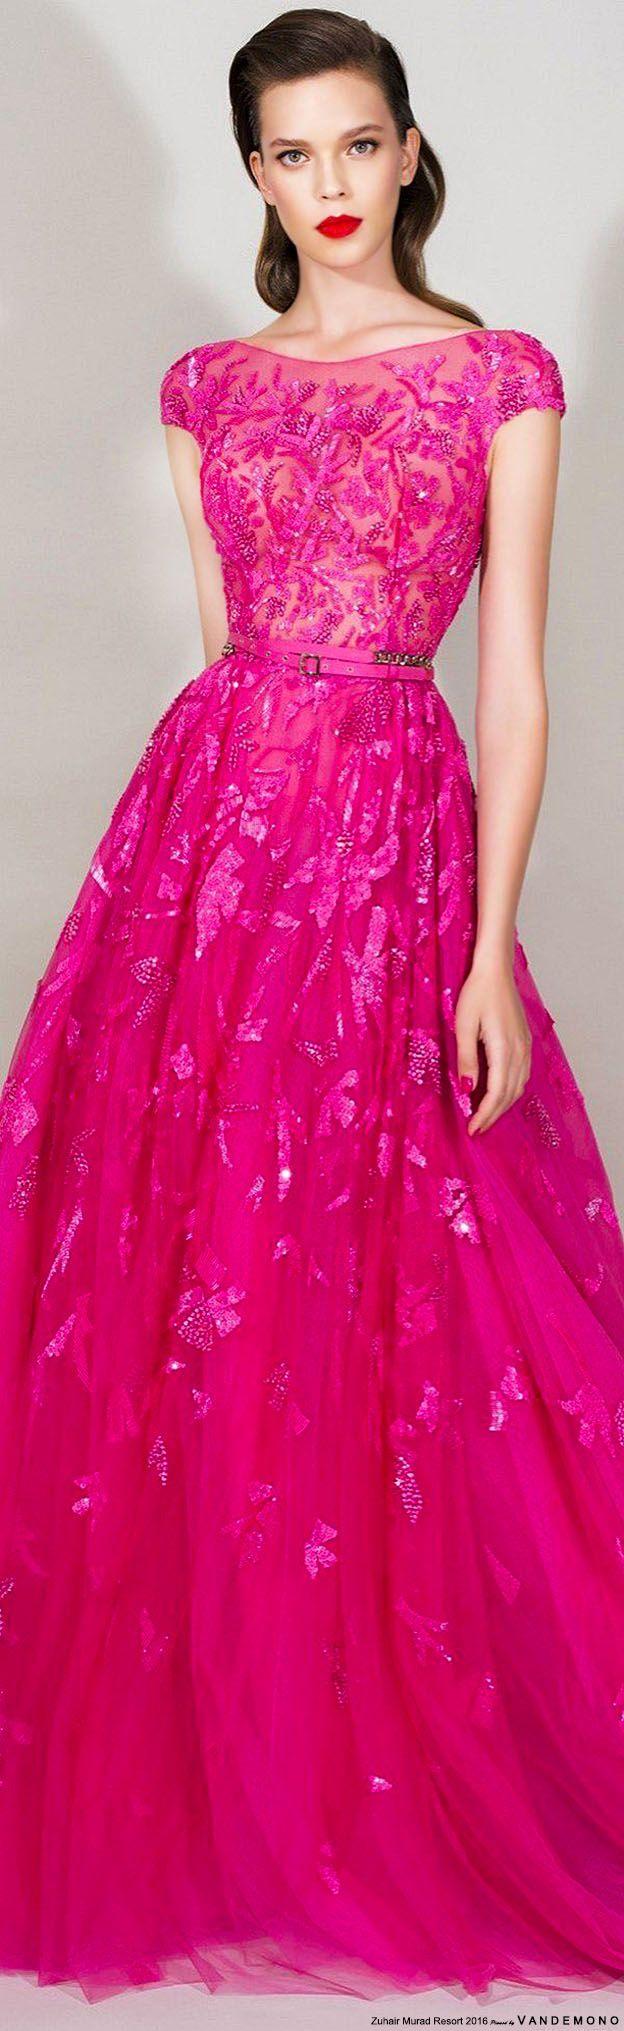 Pin de Liz Giese en Dress <3   Pinterest   Vestiditos, Vestidos de ...